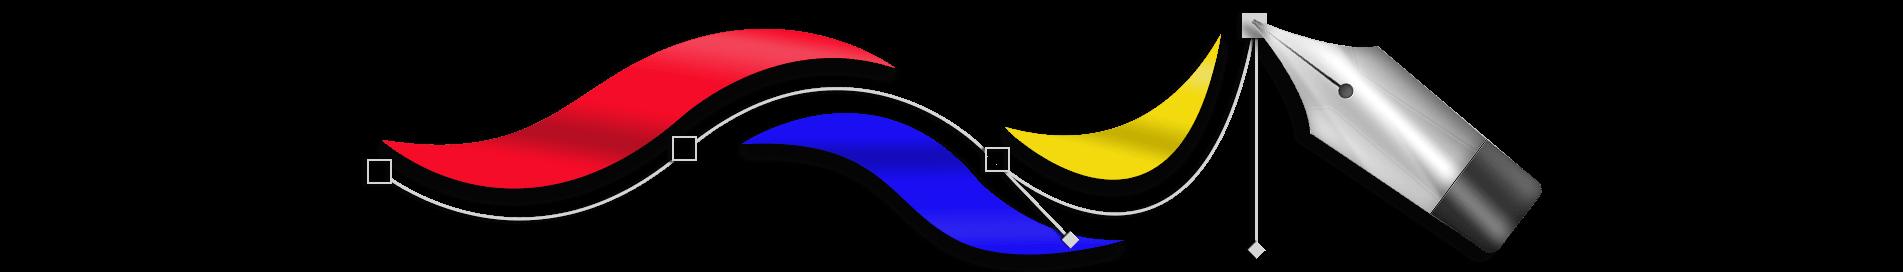 uprosper logo design course header